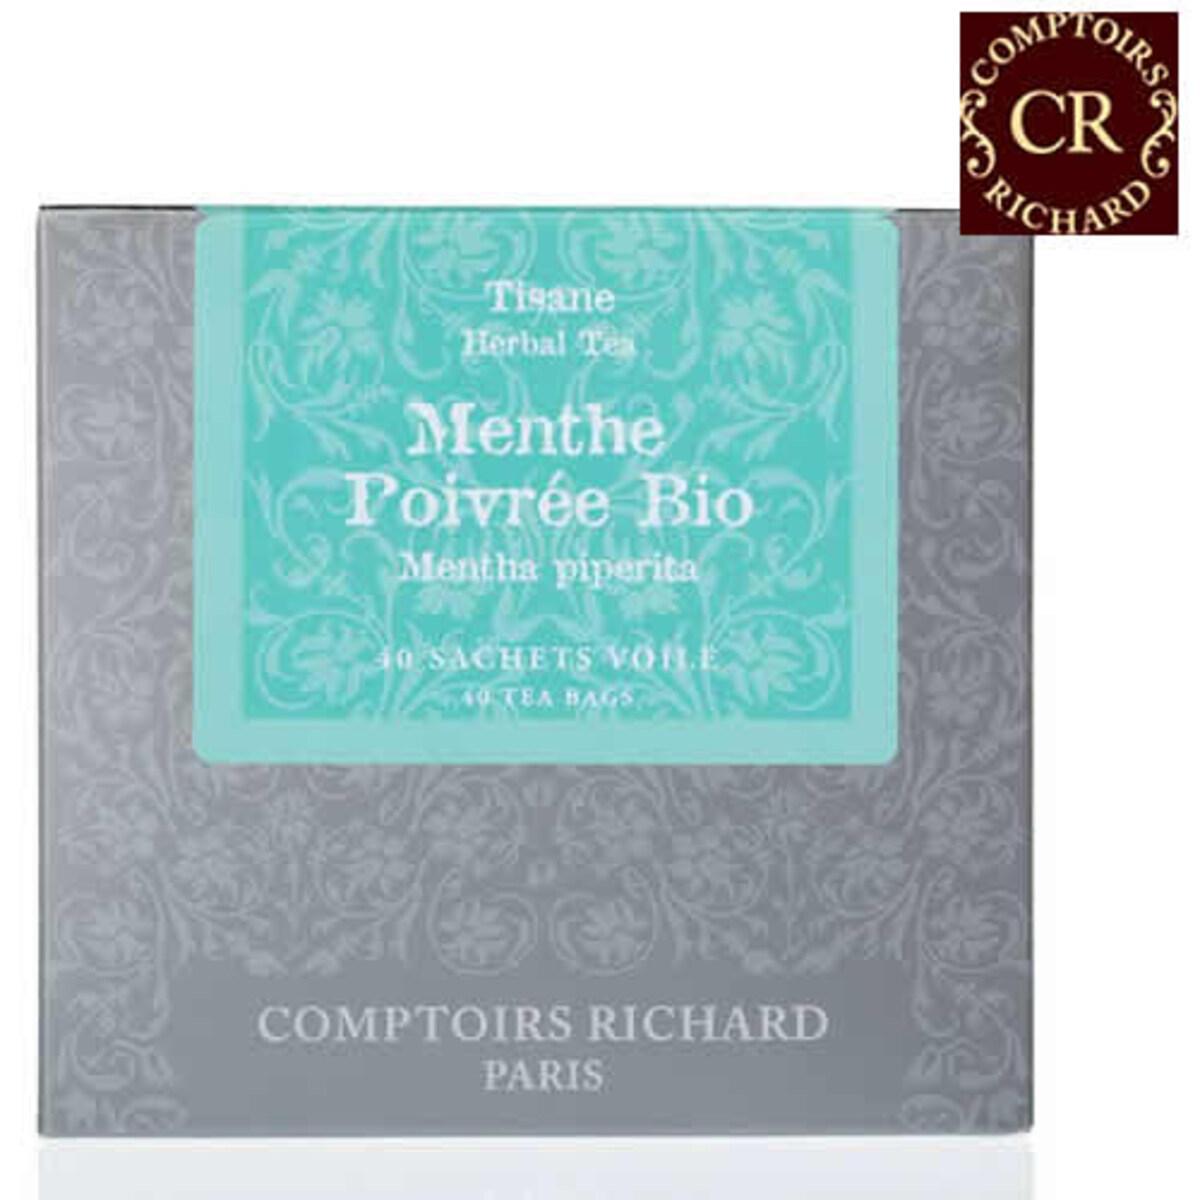 Comptoirs Richard Menthe Poivrée Bio - 40бр сашета билков чай био Мента